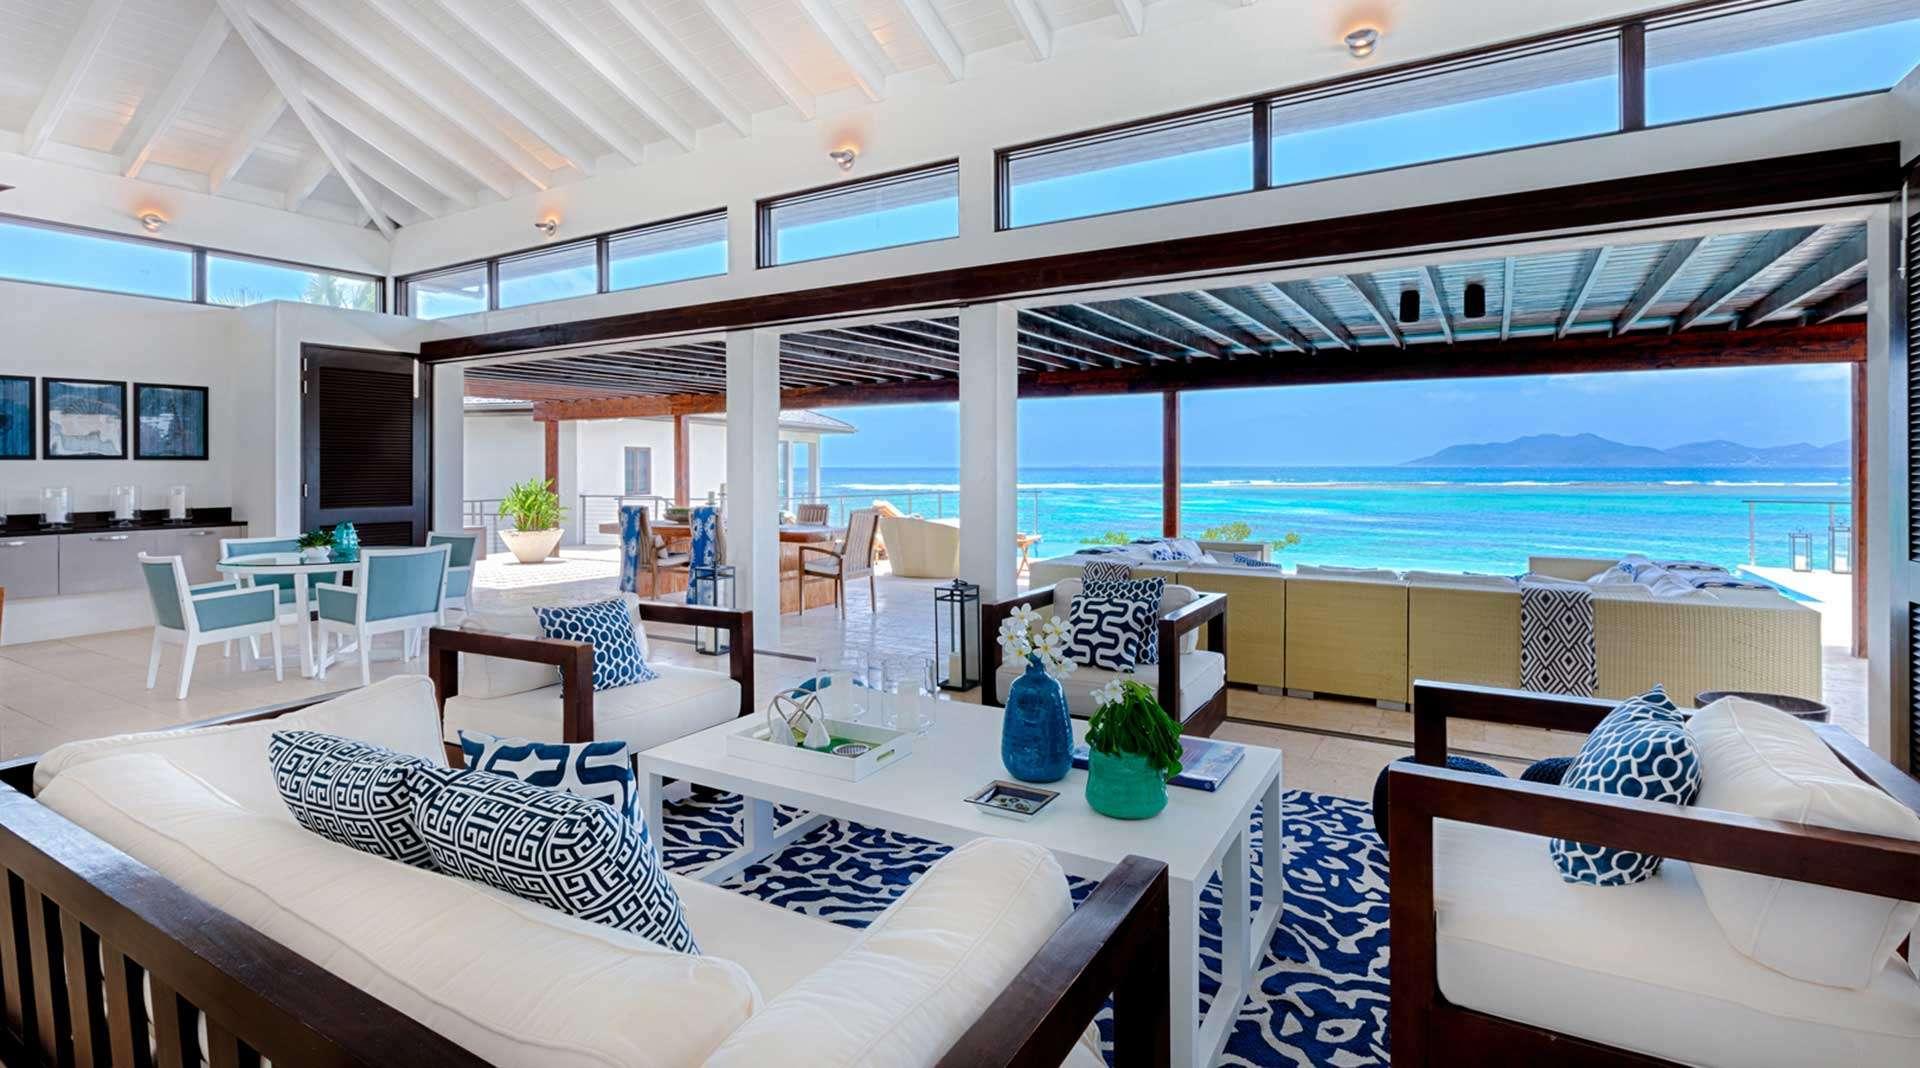 Luxury villa rentals caribbean - Anguilla - Little harbour anguilla - No location 4 - Kamique Estate | Triton - Image 1/14